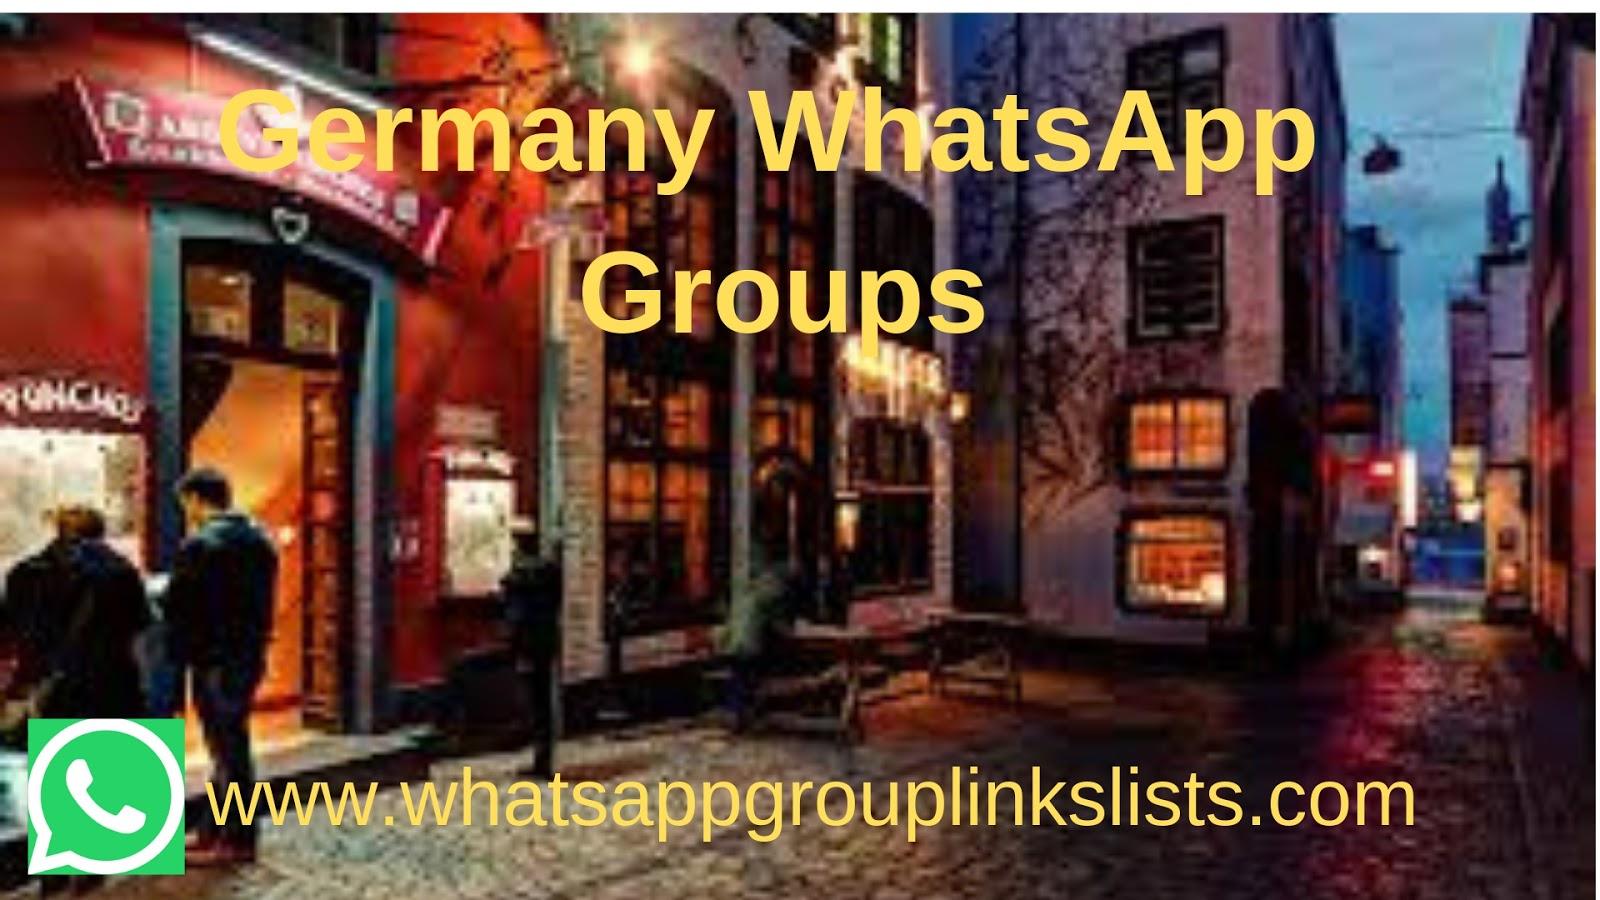 Join Germany WhatsApp Group Links List